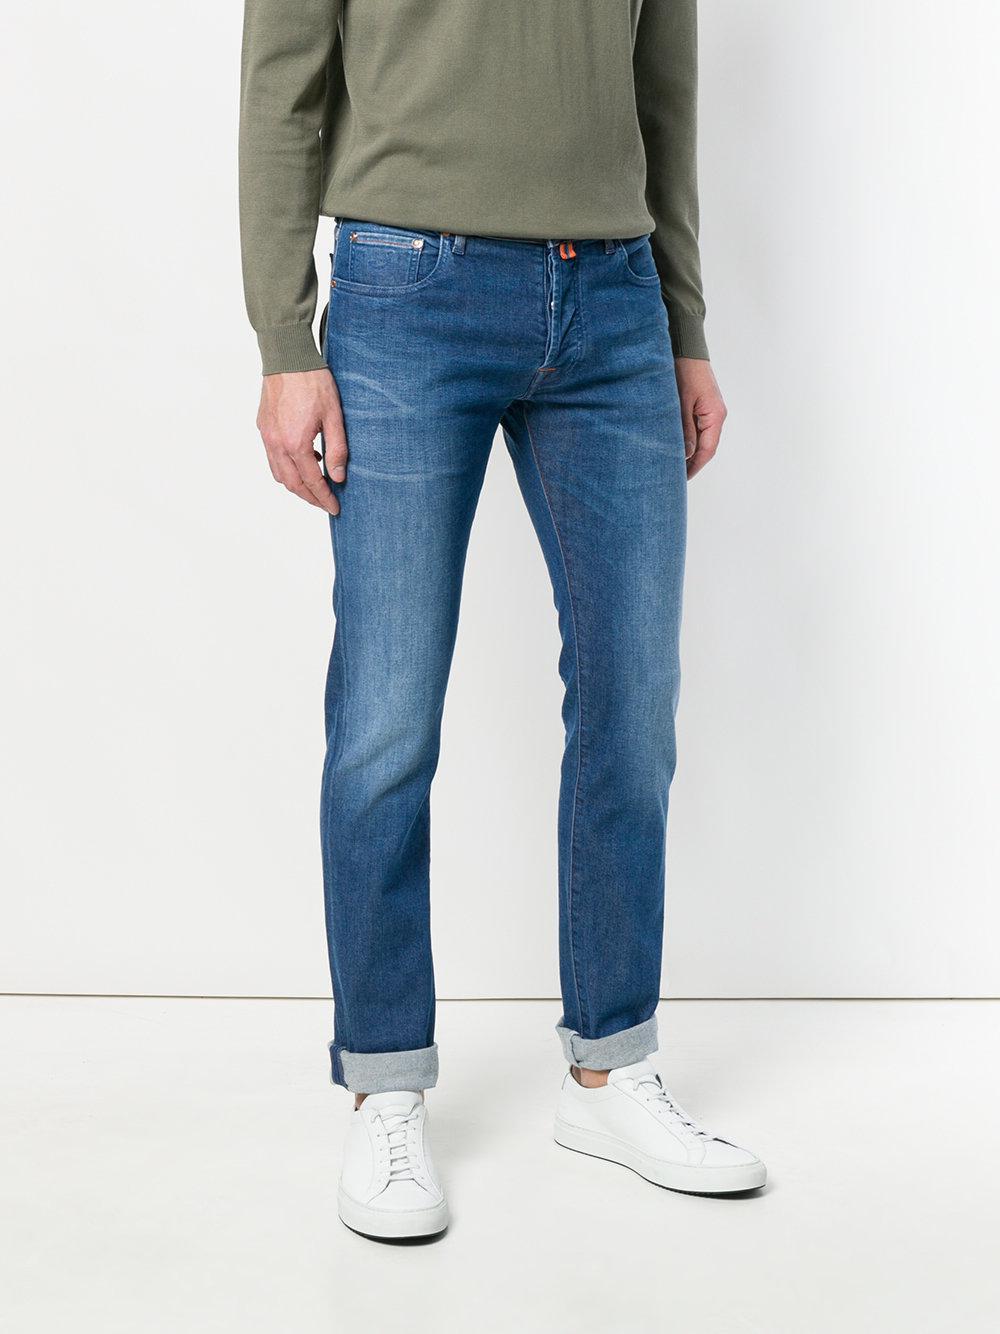 Jacob Cohen Slim Fit Denim Trousers in Blue for Men